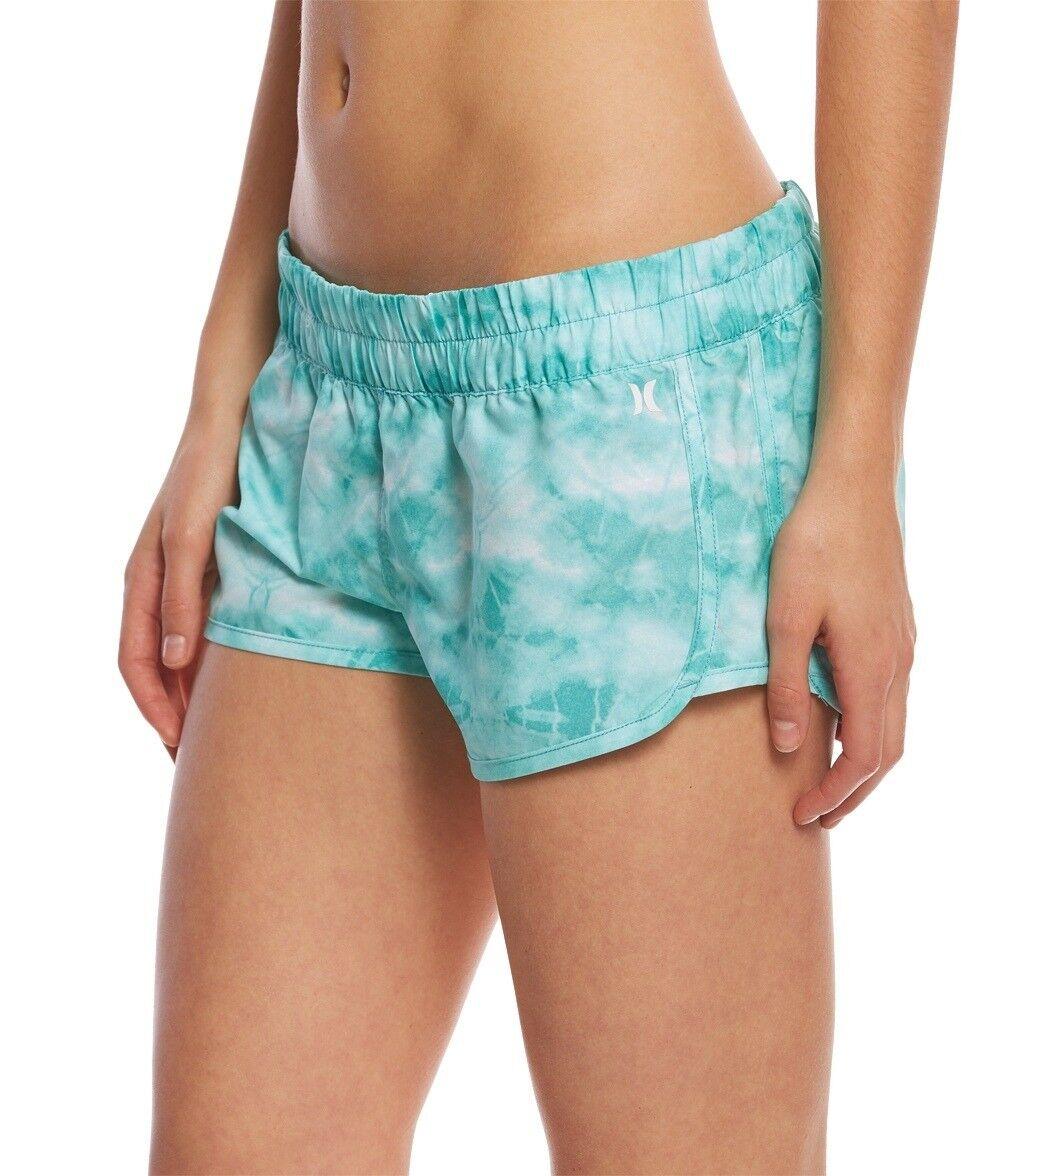 nike board shorts for women tye dye - HD1044×1176